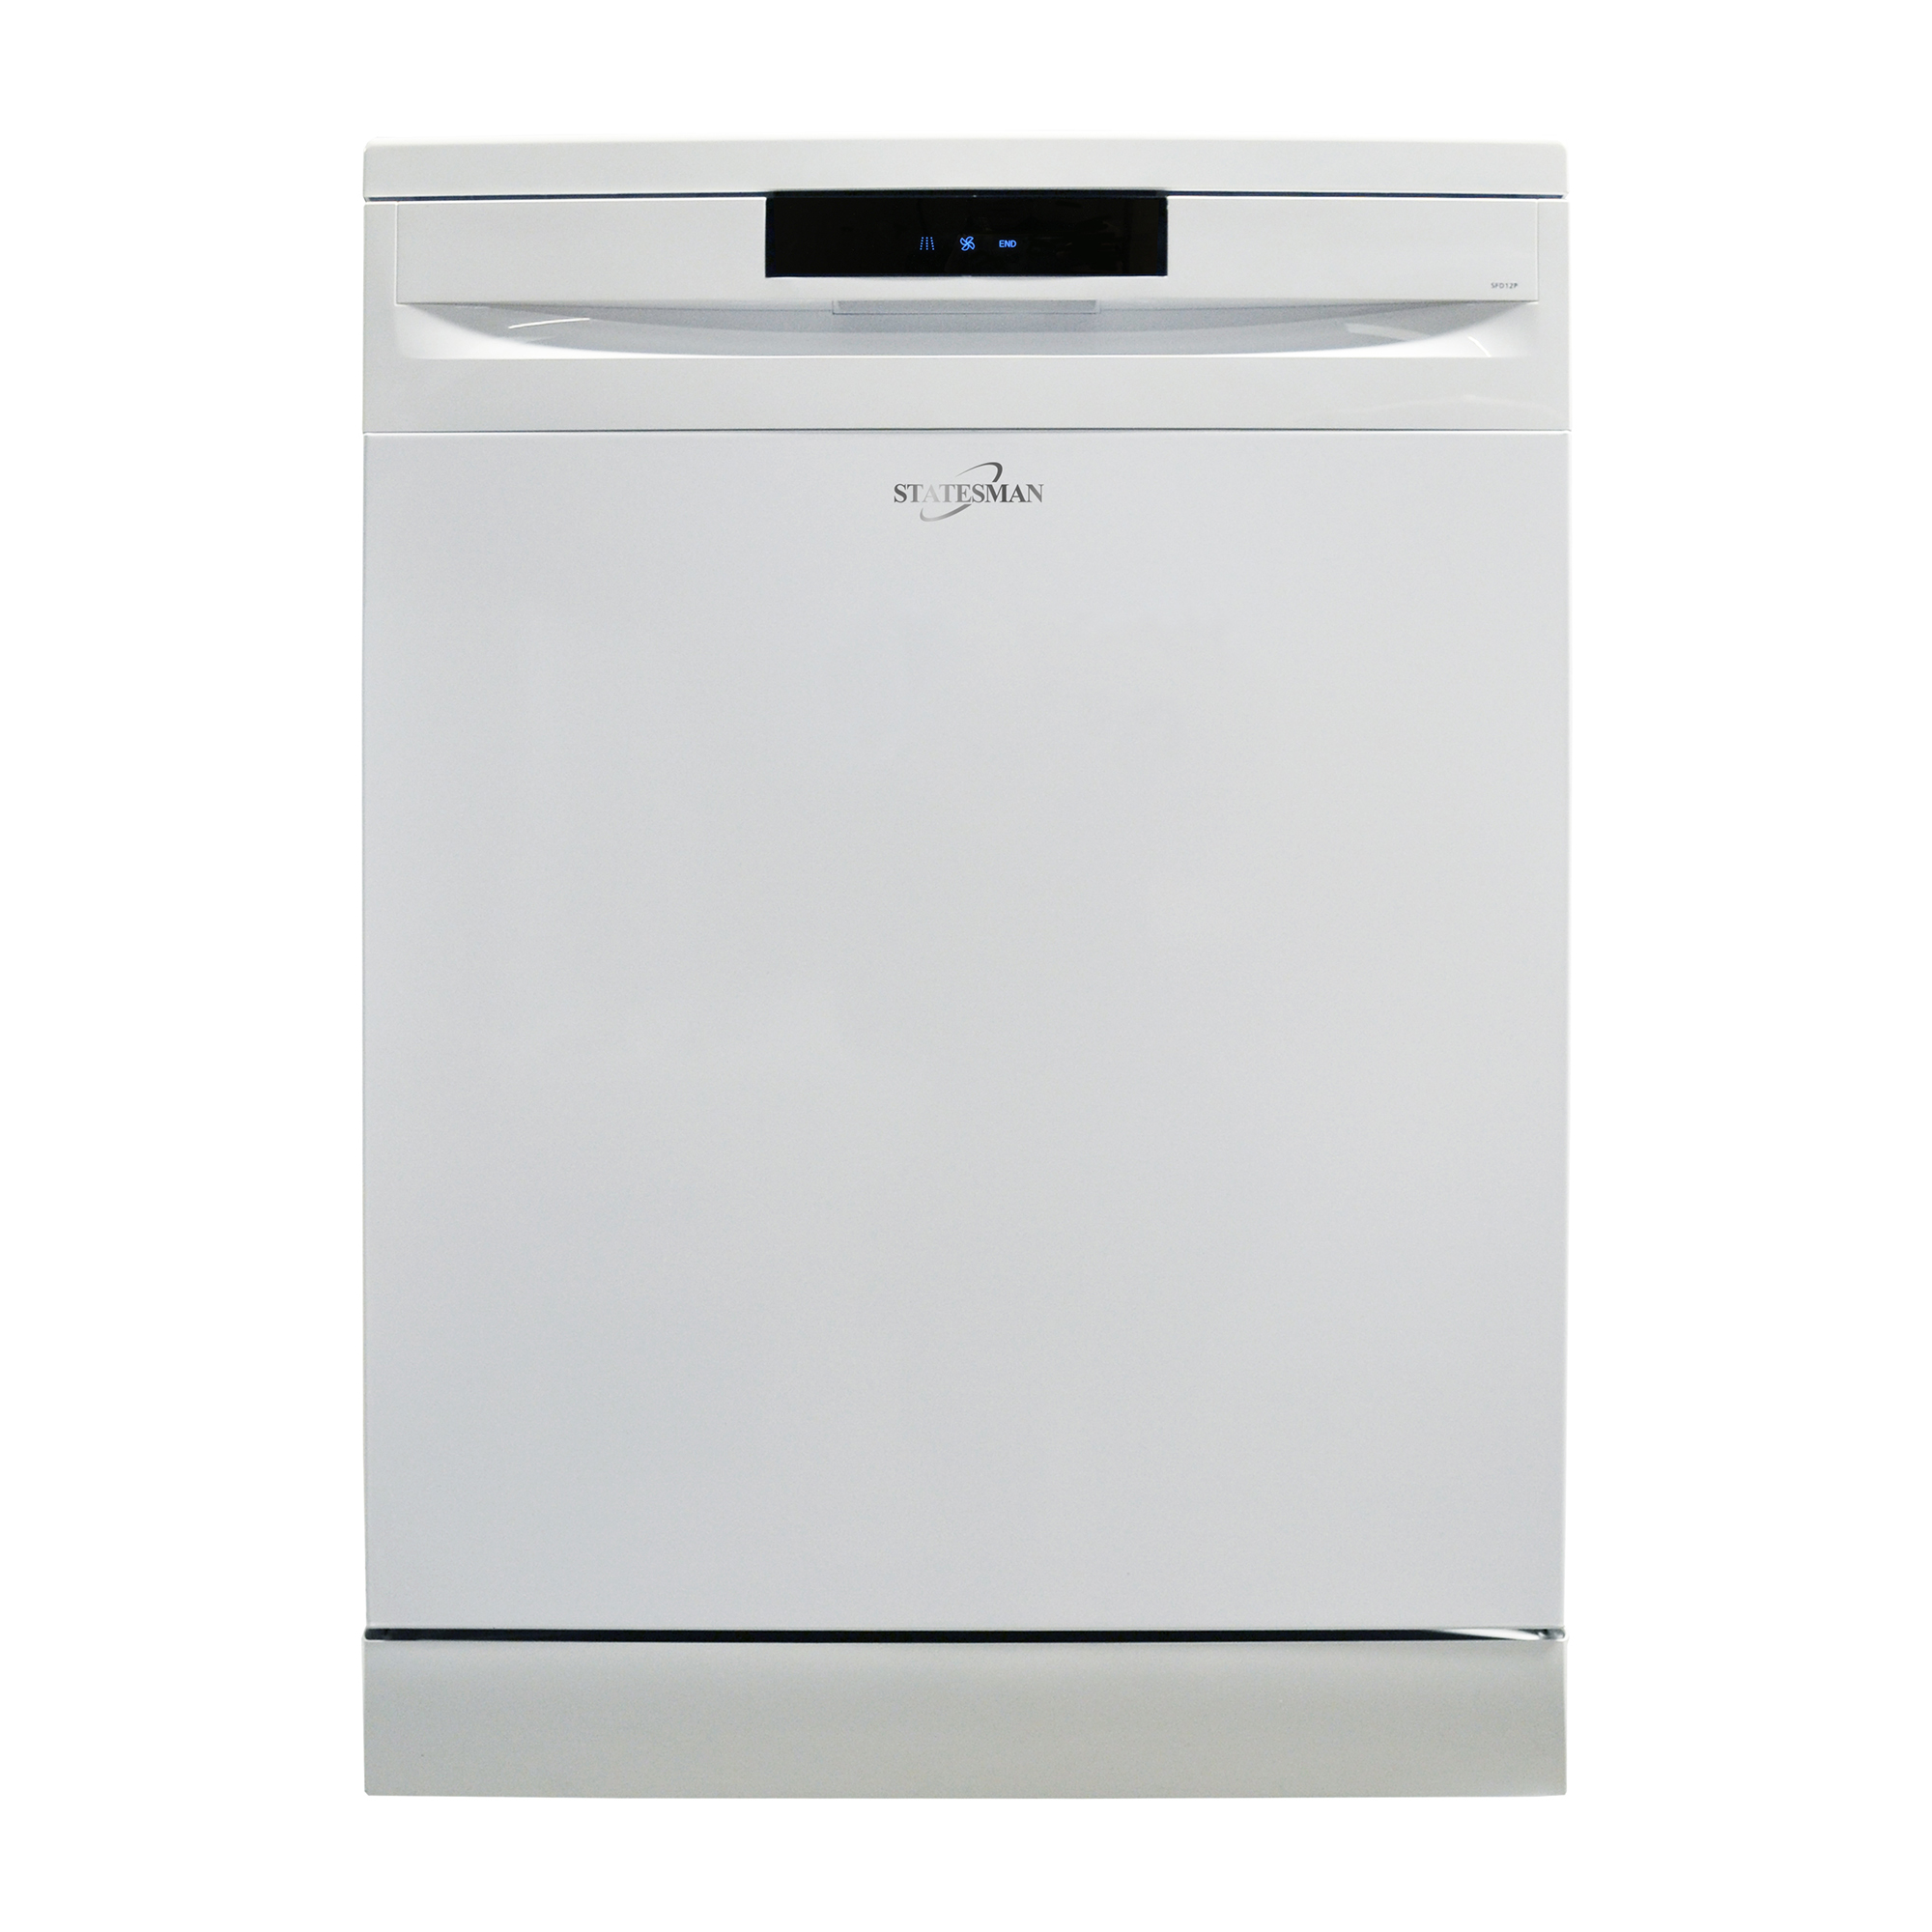 Statesman Dishwasher A++ Rating Flood Protection 60cm White Ref SFD12P